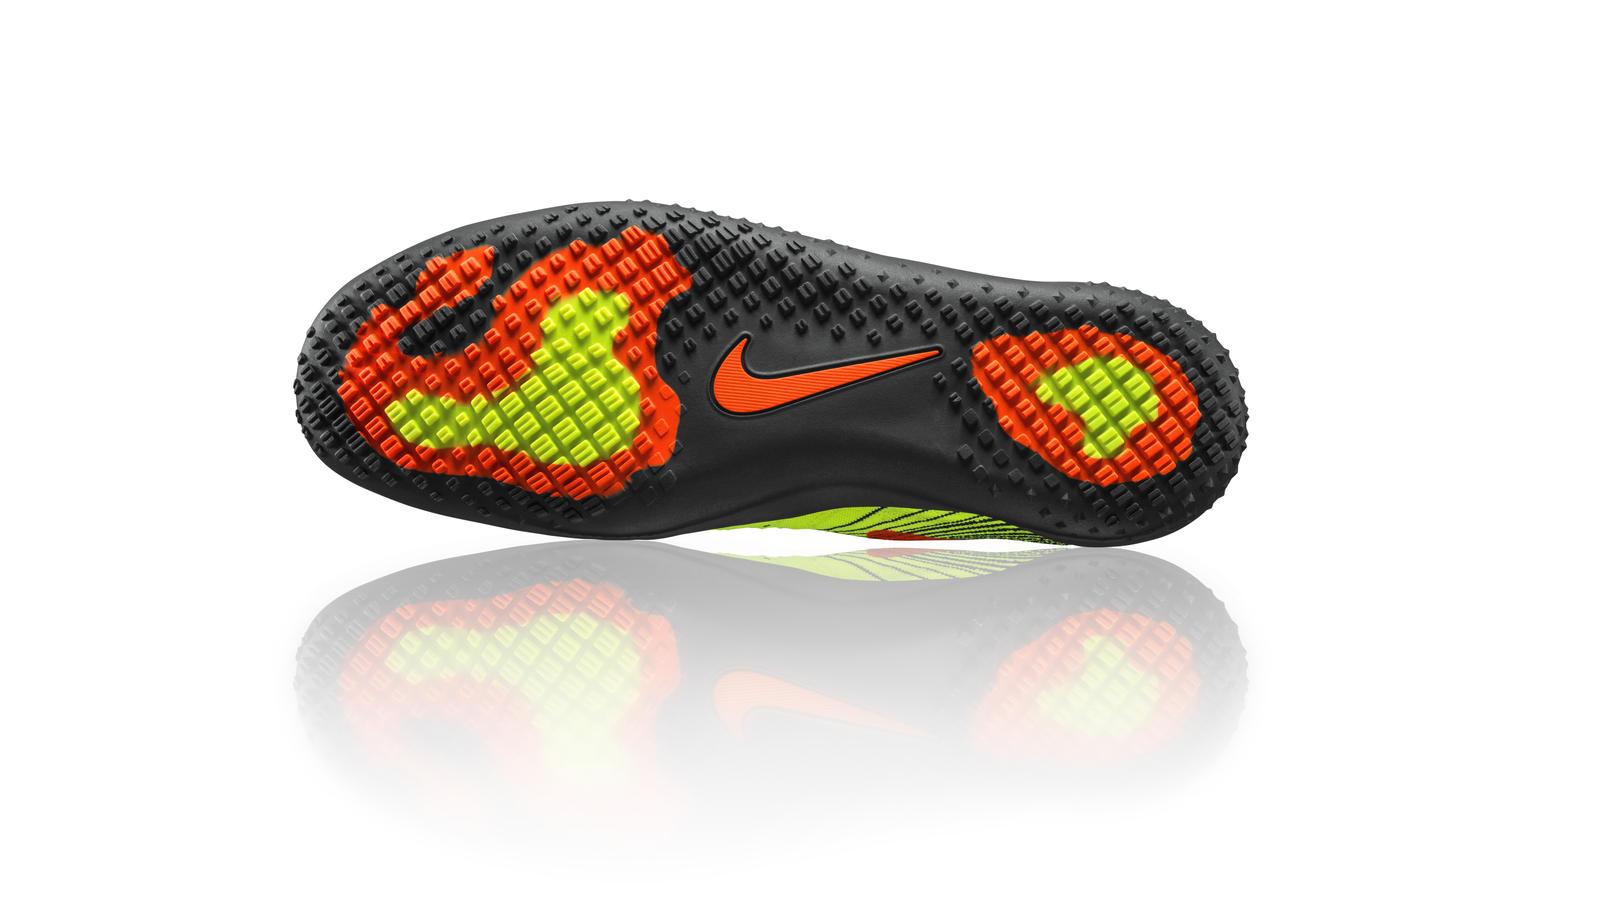 Nike%20 Free%20 Hyperfeel%20 Tr%20outsole